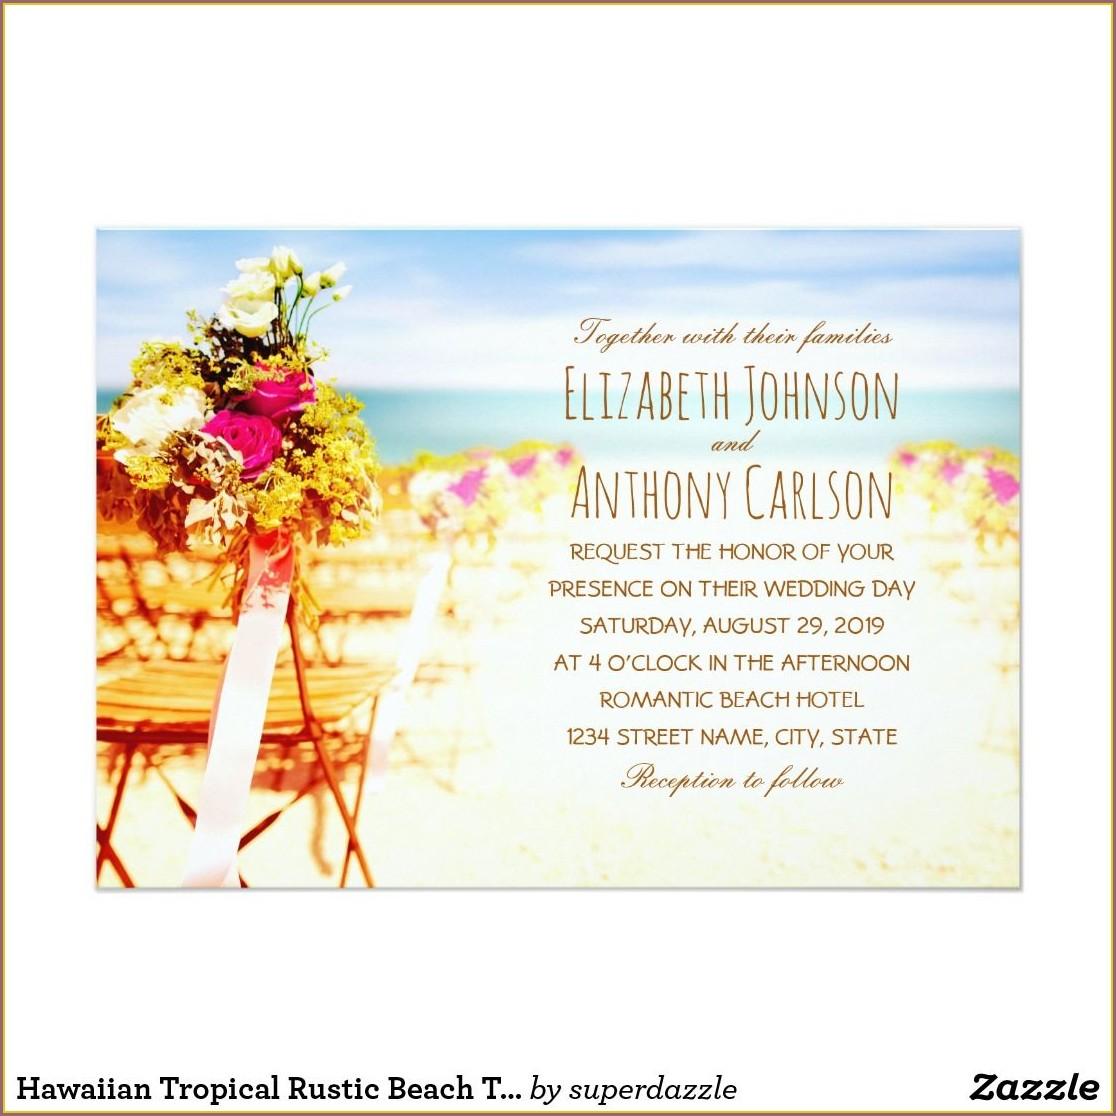 Rustic Beach Themed Wedding Invitations